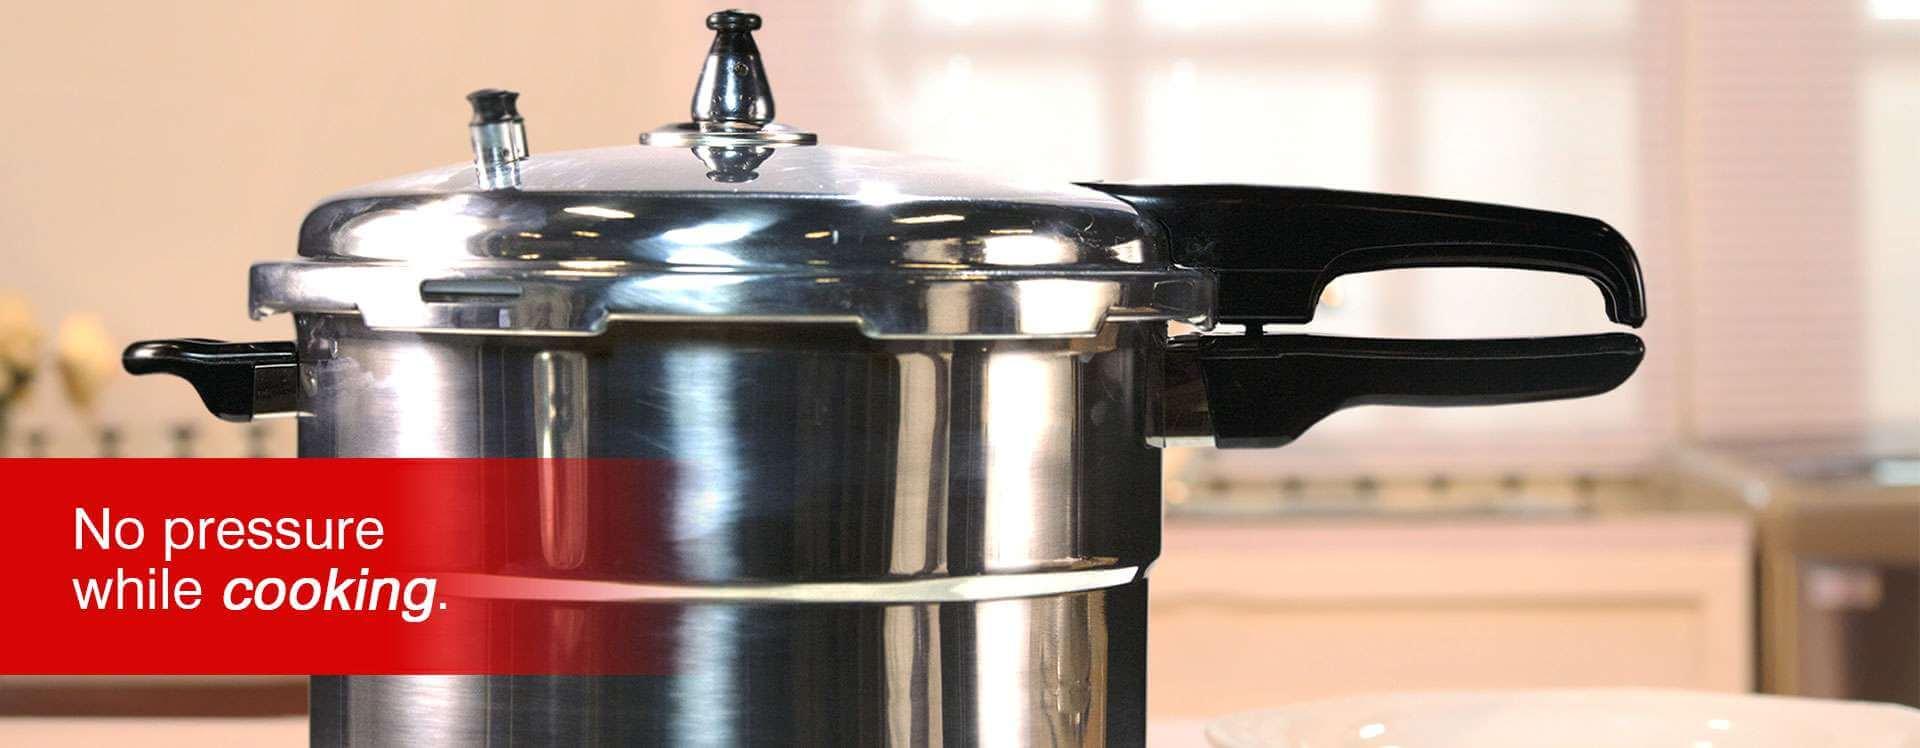 37-pressure-cooker